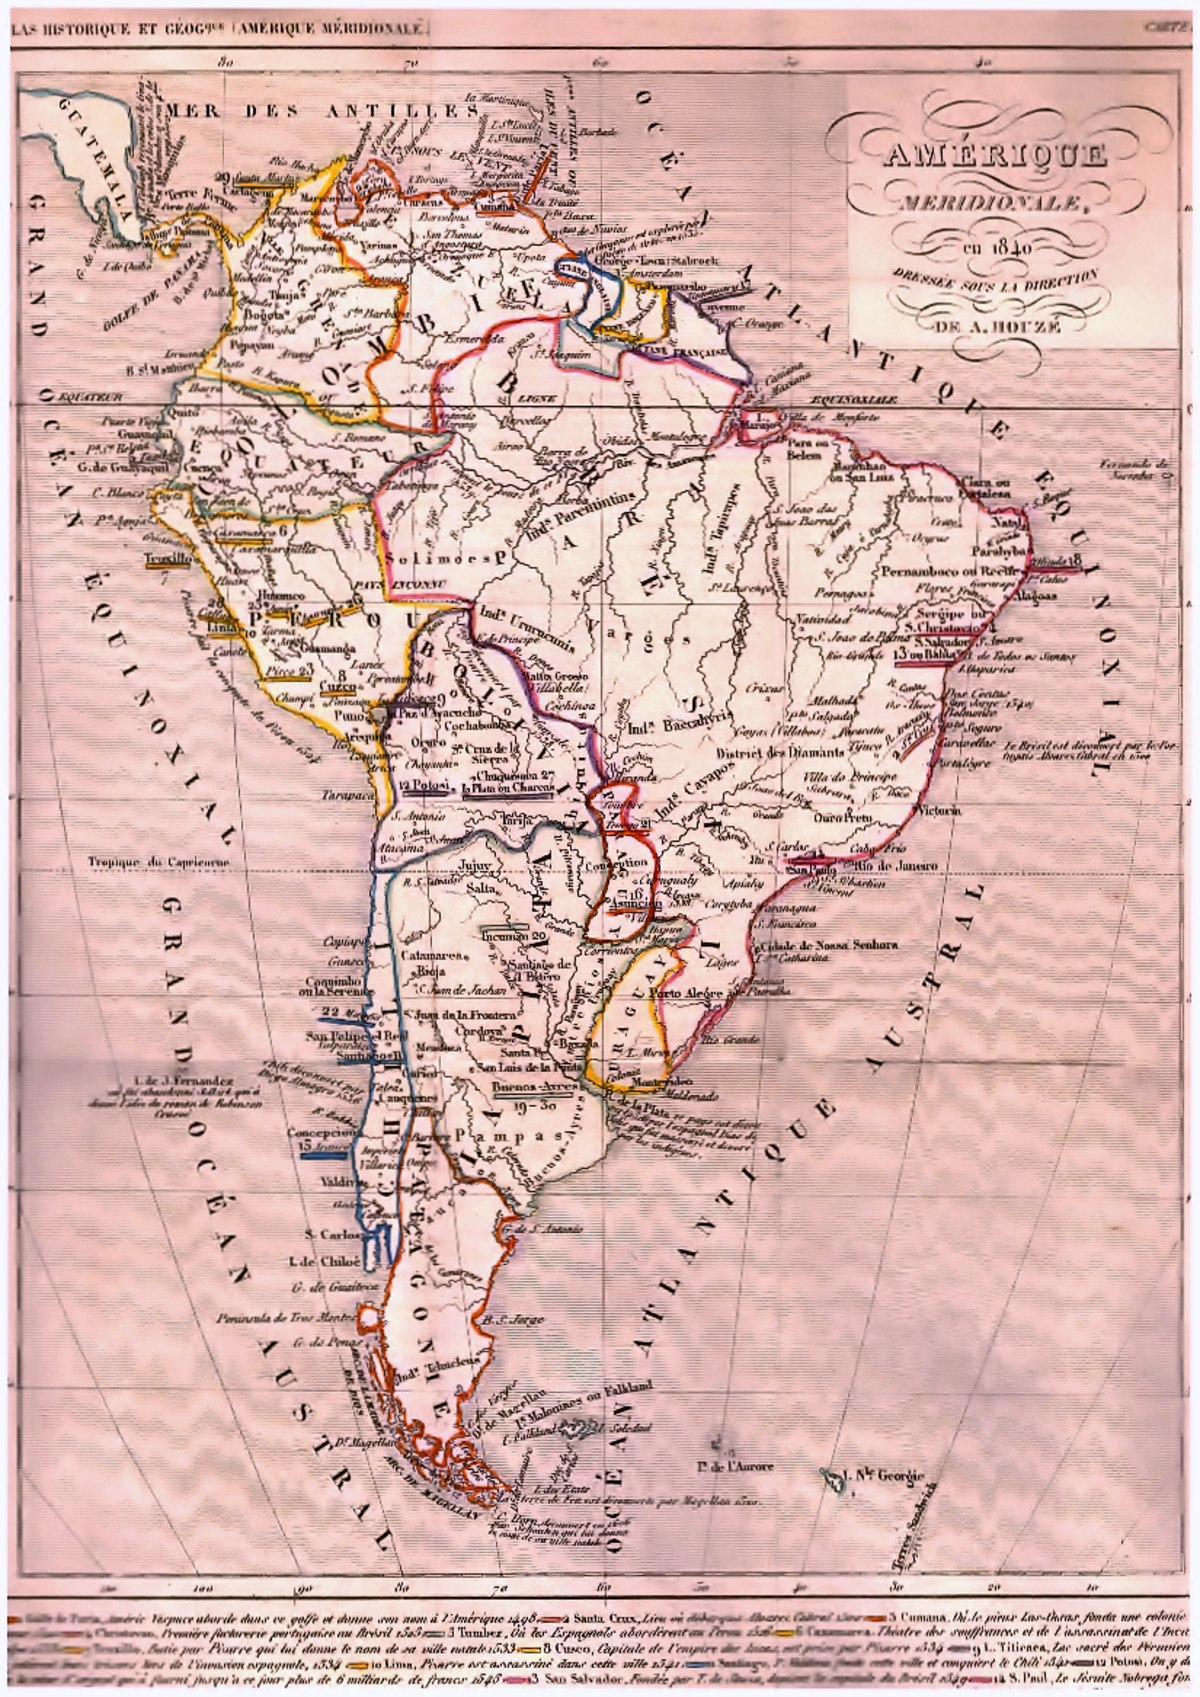 Histoire de l 39 argentine wikip dia Histoire des jardins wikipedia